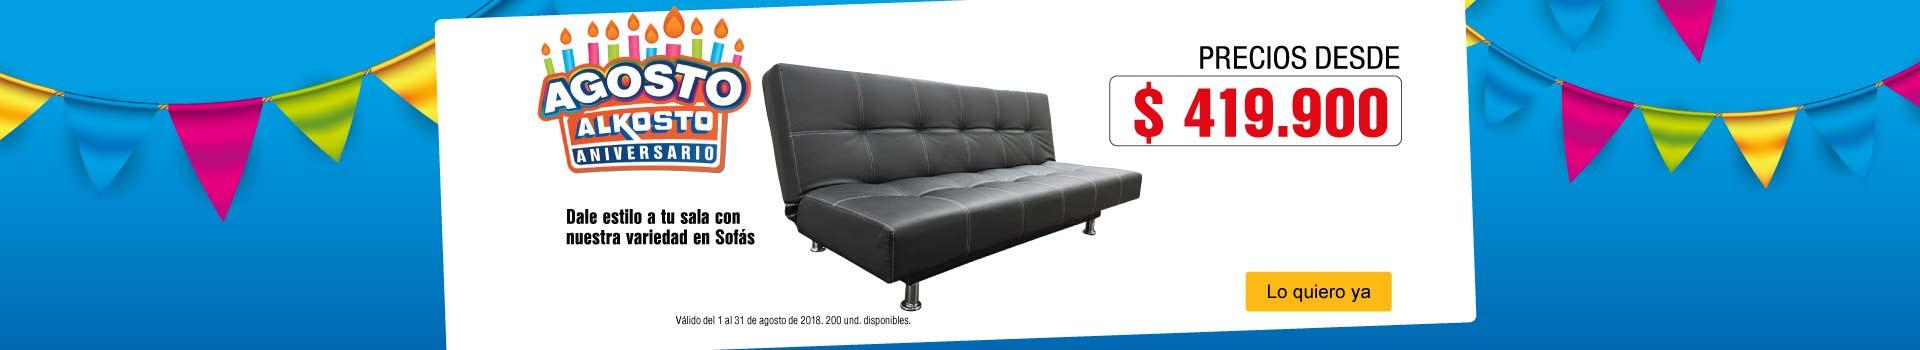 AK-BCAT-3-hogar-DCAT-Tukasa-sofas-Ago15